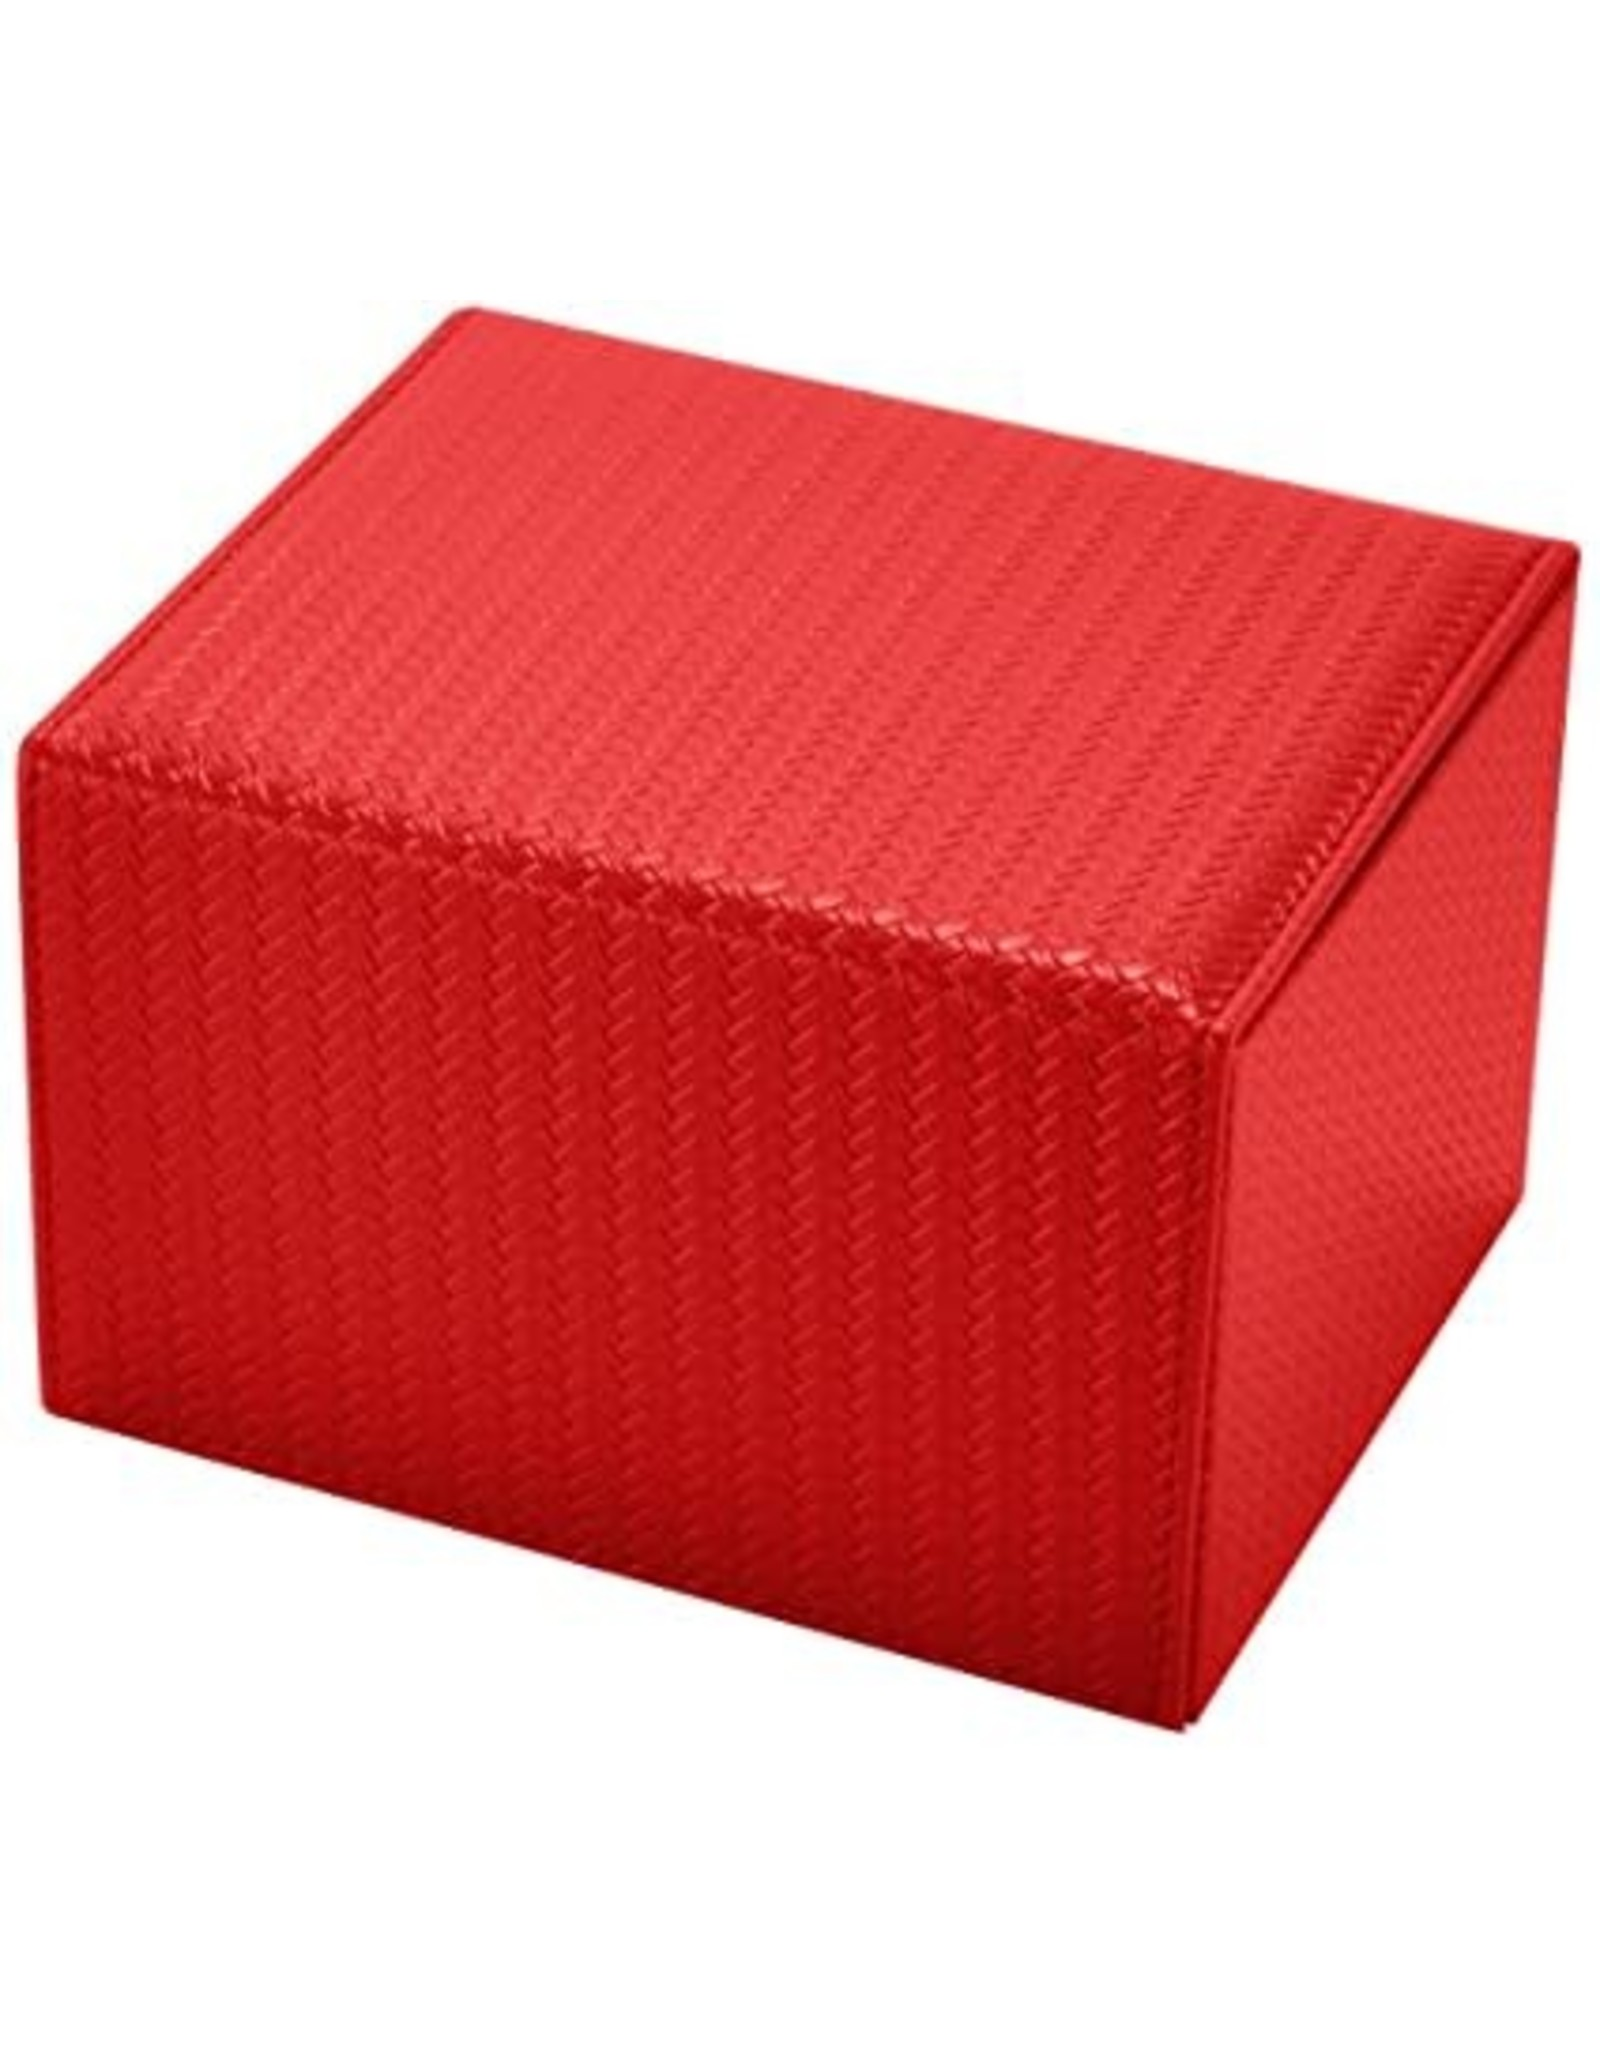 Dex Protection Dex Proline Large Red 100ct